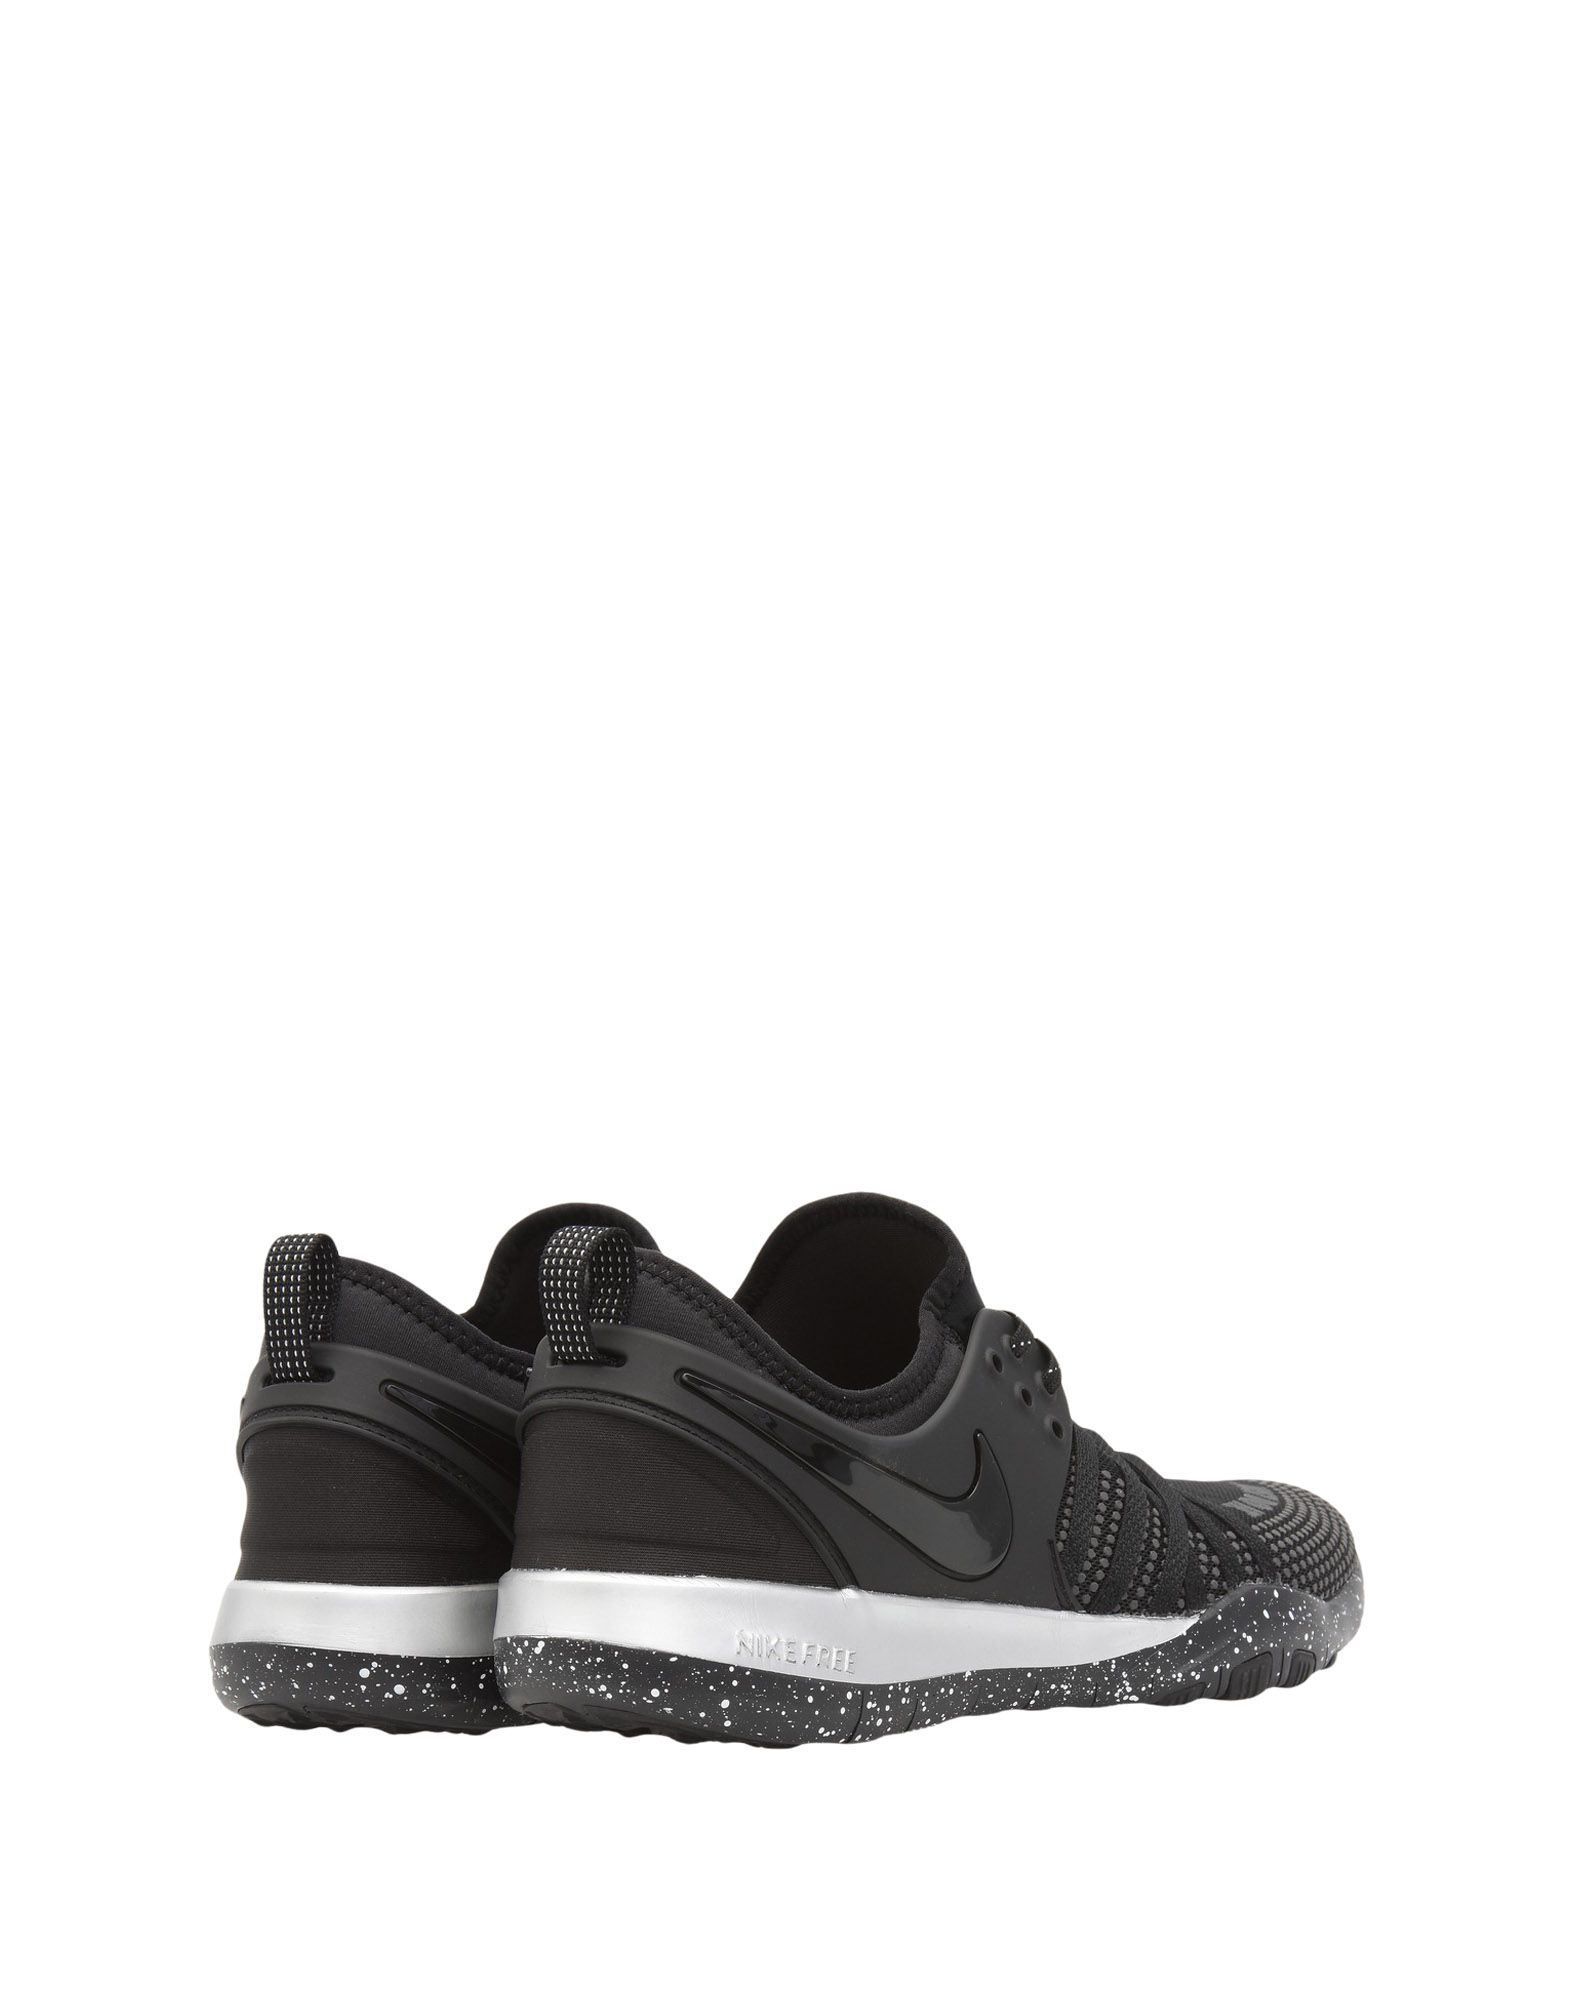 Nike   Free 11441358LE Tr 7 Selfie  11441358LE Free Gute Qualität beliebte Schuhe b7e21e